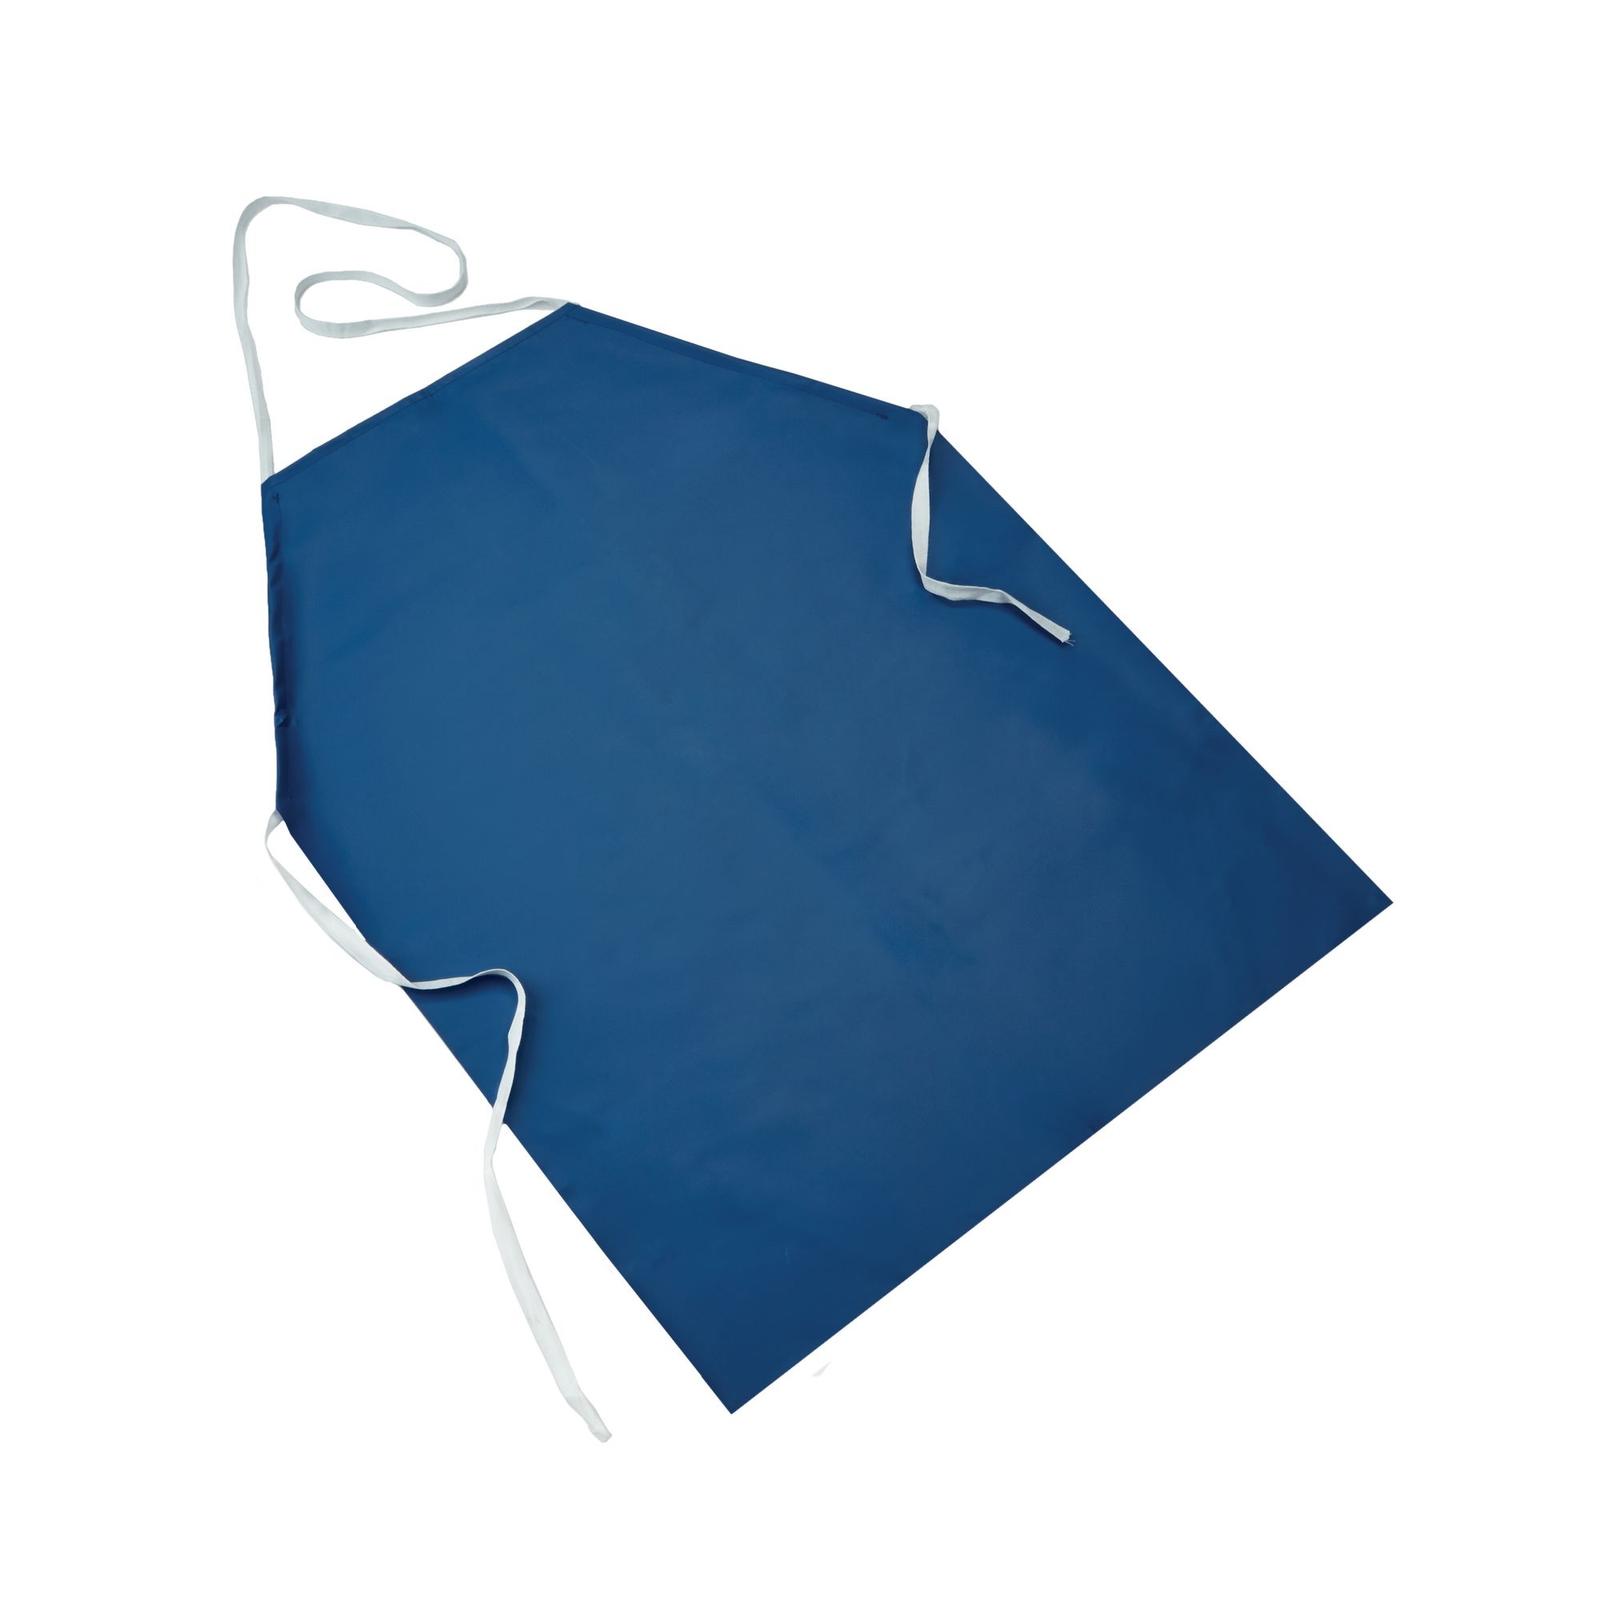 PVC Waterproof Apron - Adult 72 x 96cm